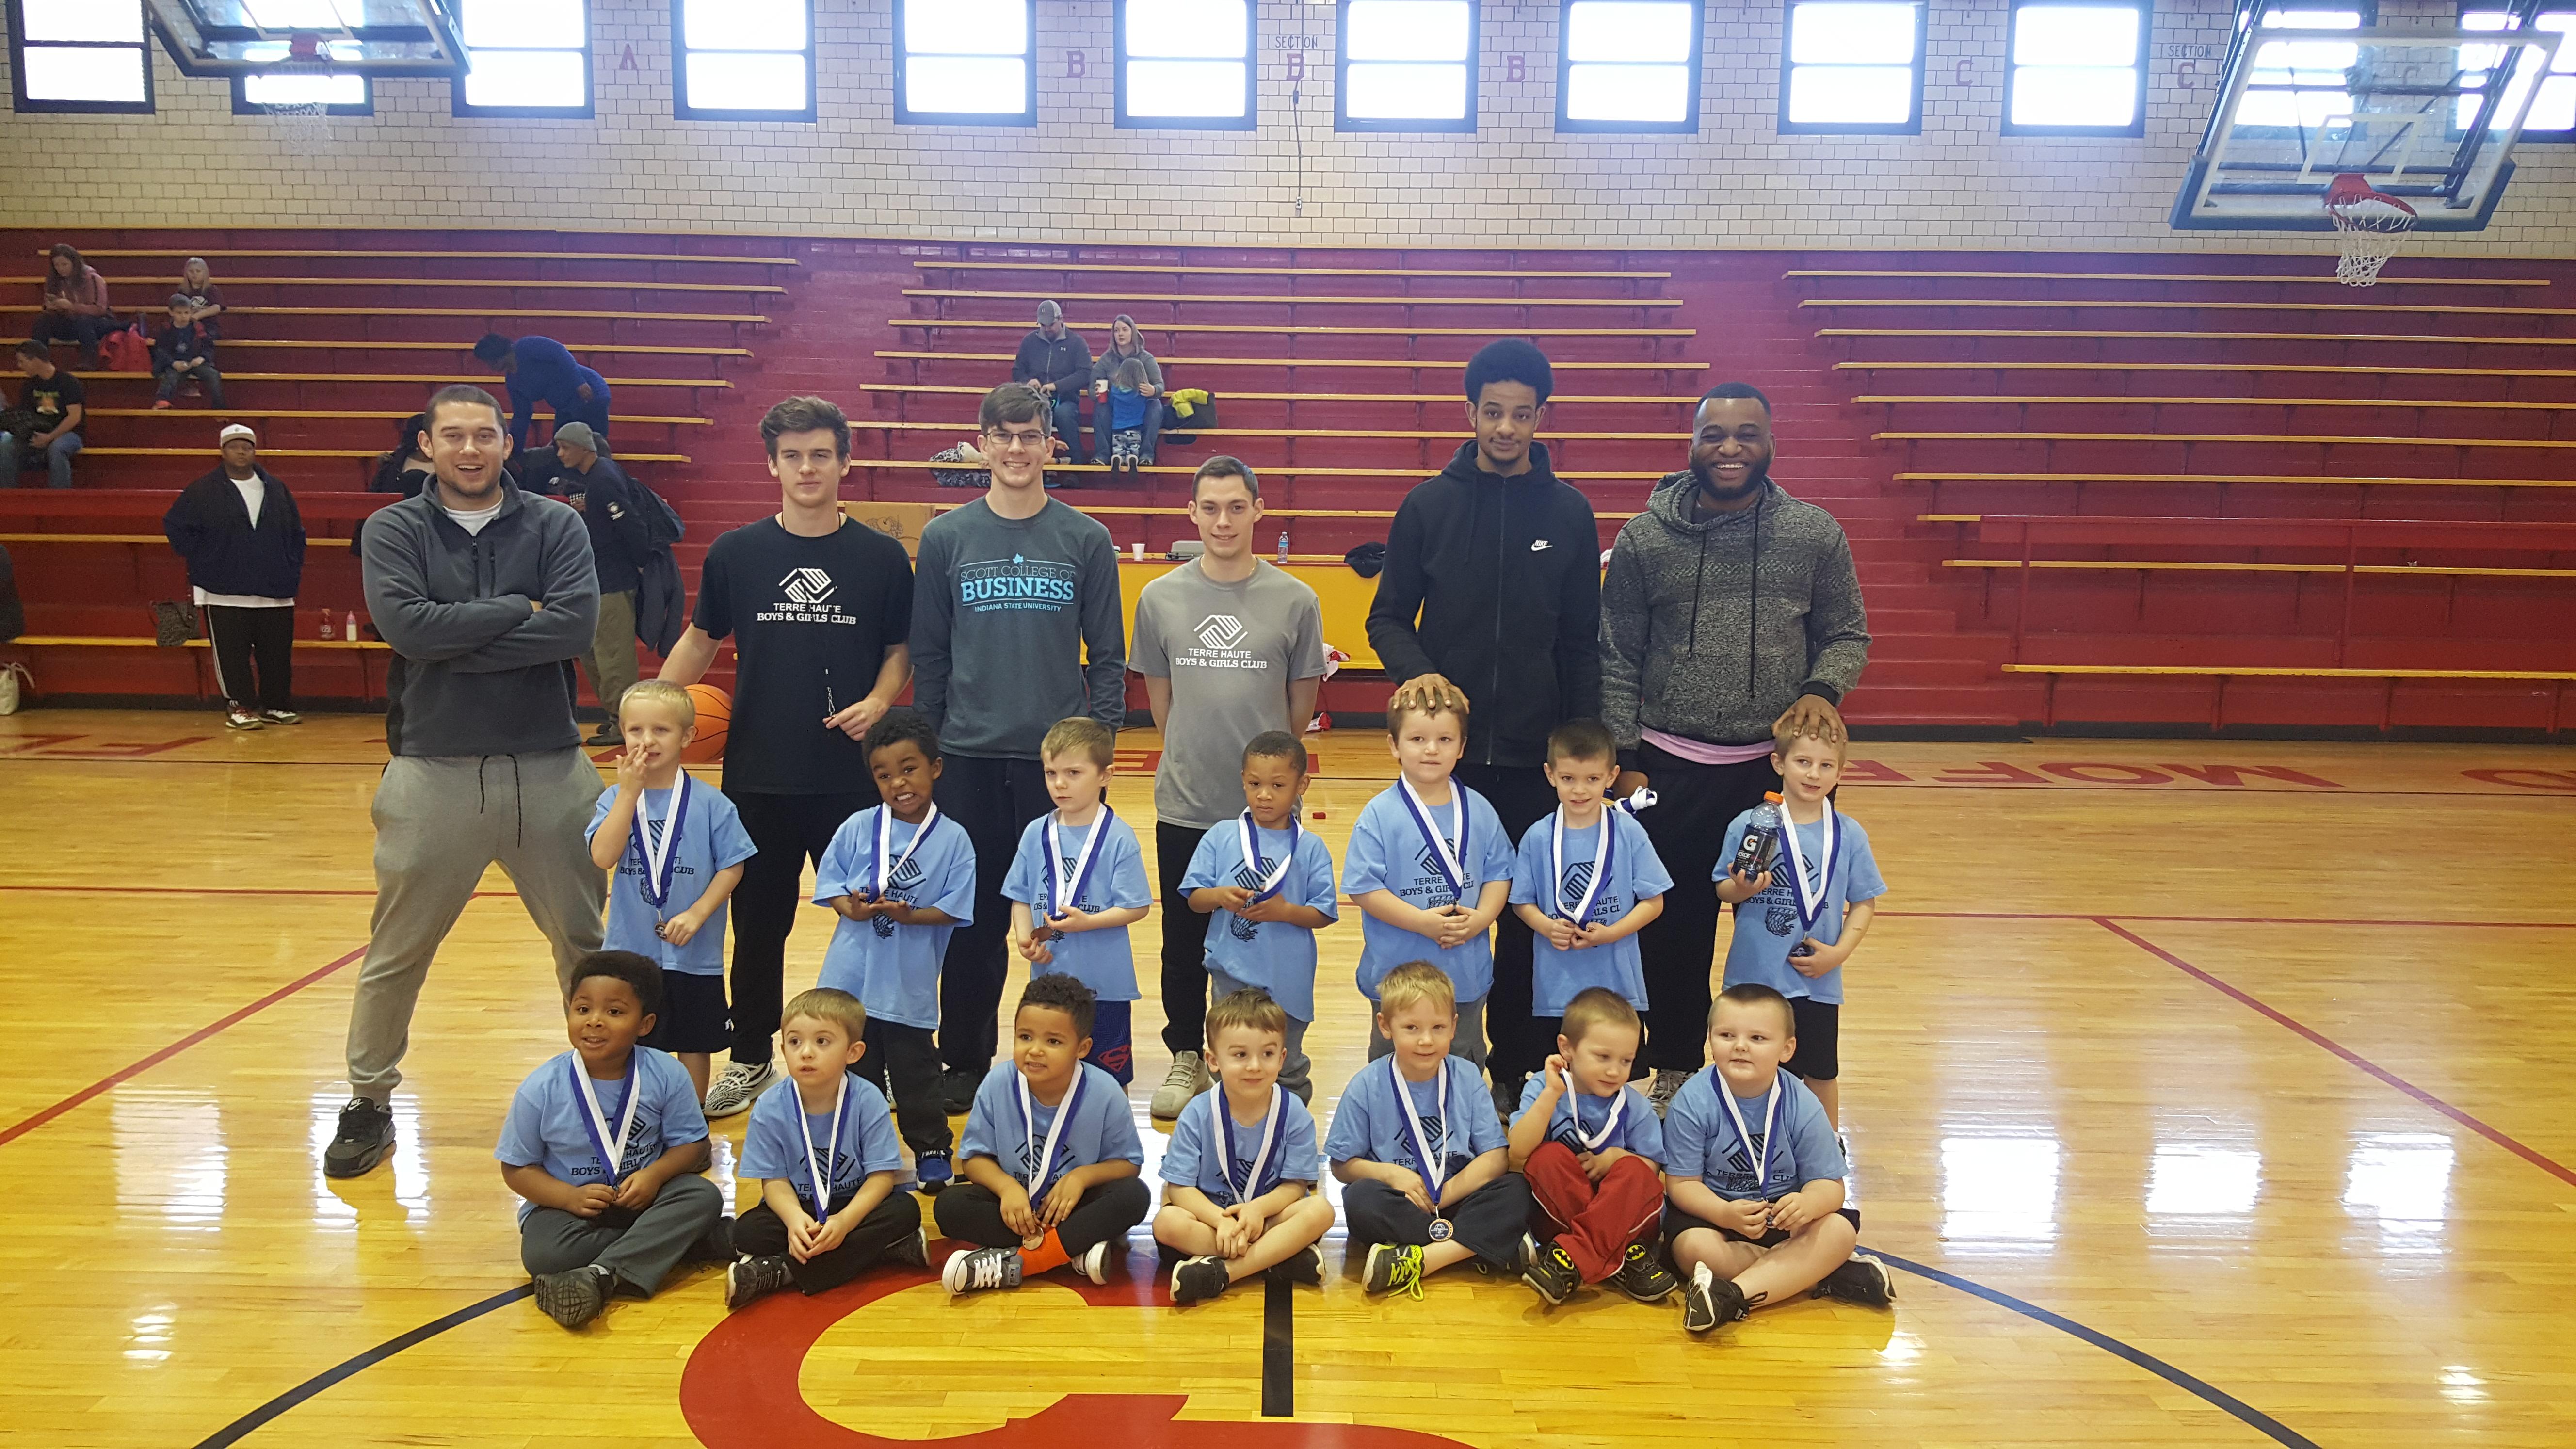 Terre Haute Boys Girls Club Sports Our Sports Pre School